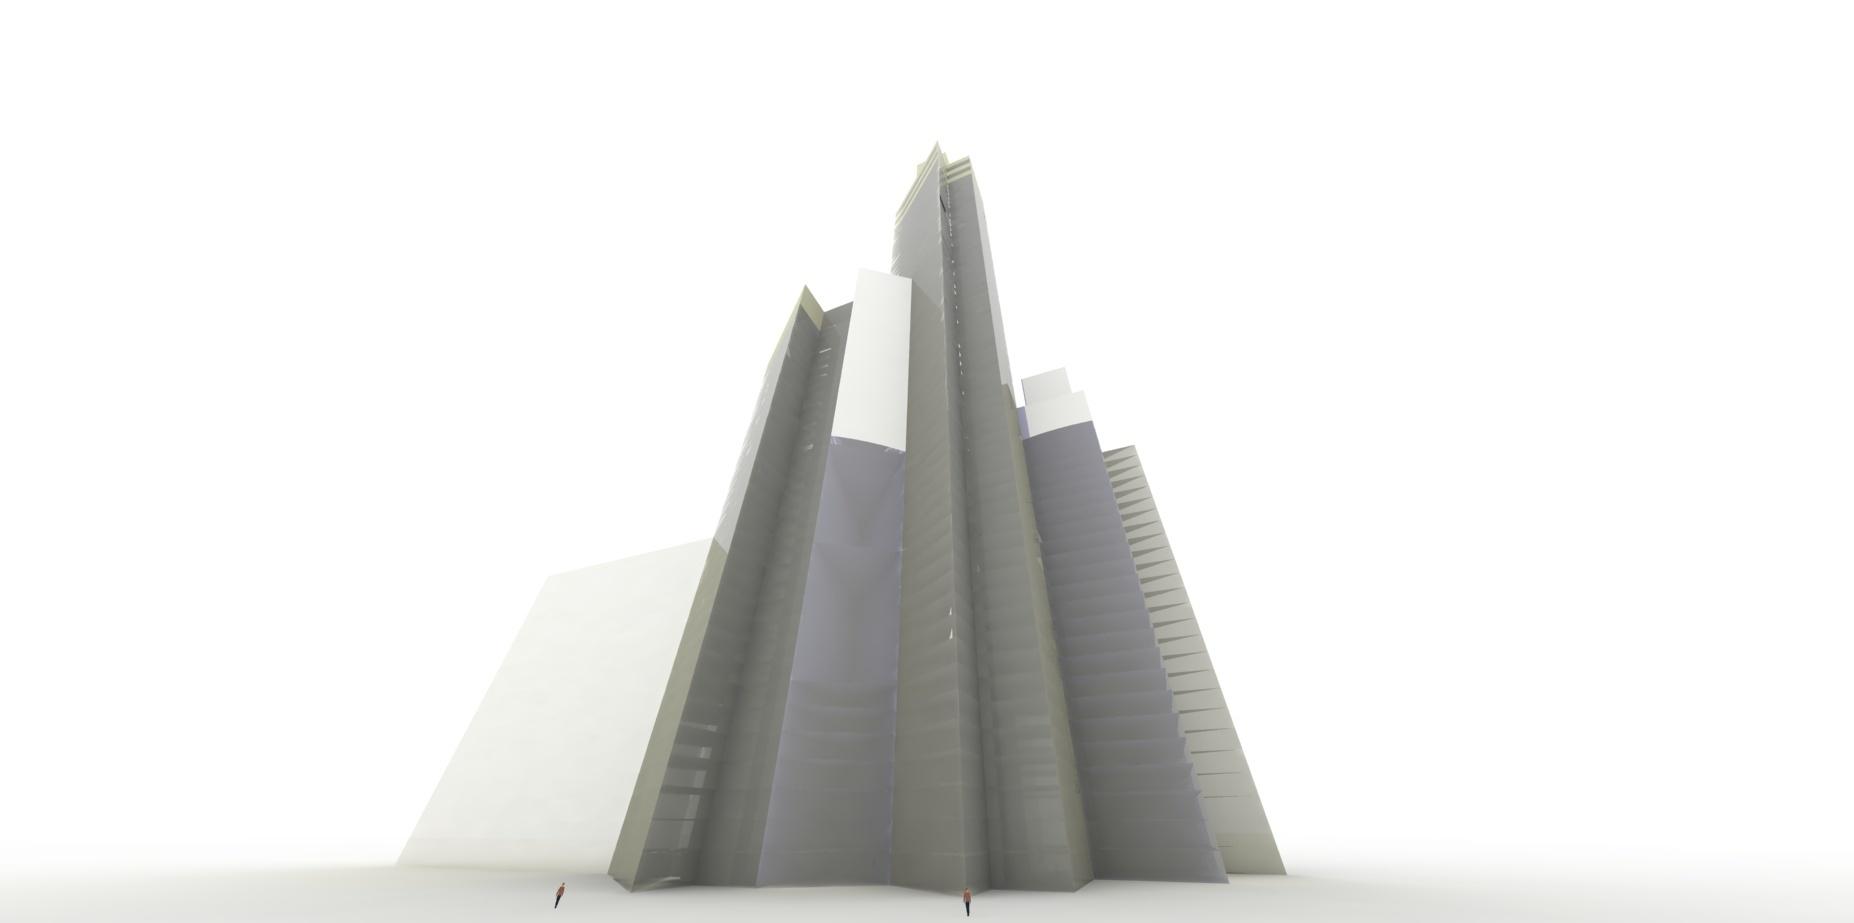 SketchUp'eur architecte -AnthO'- - Page 4 Buildi10